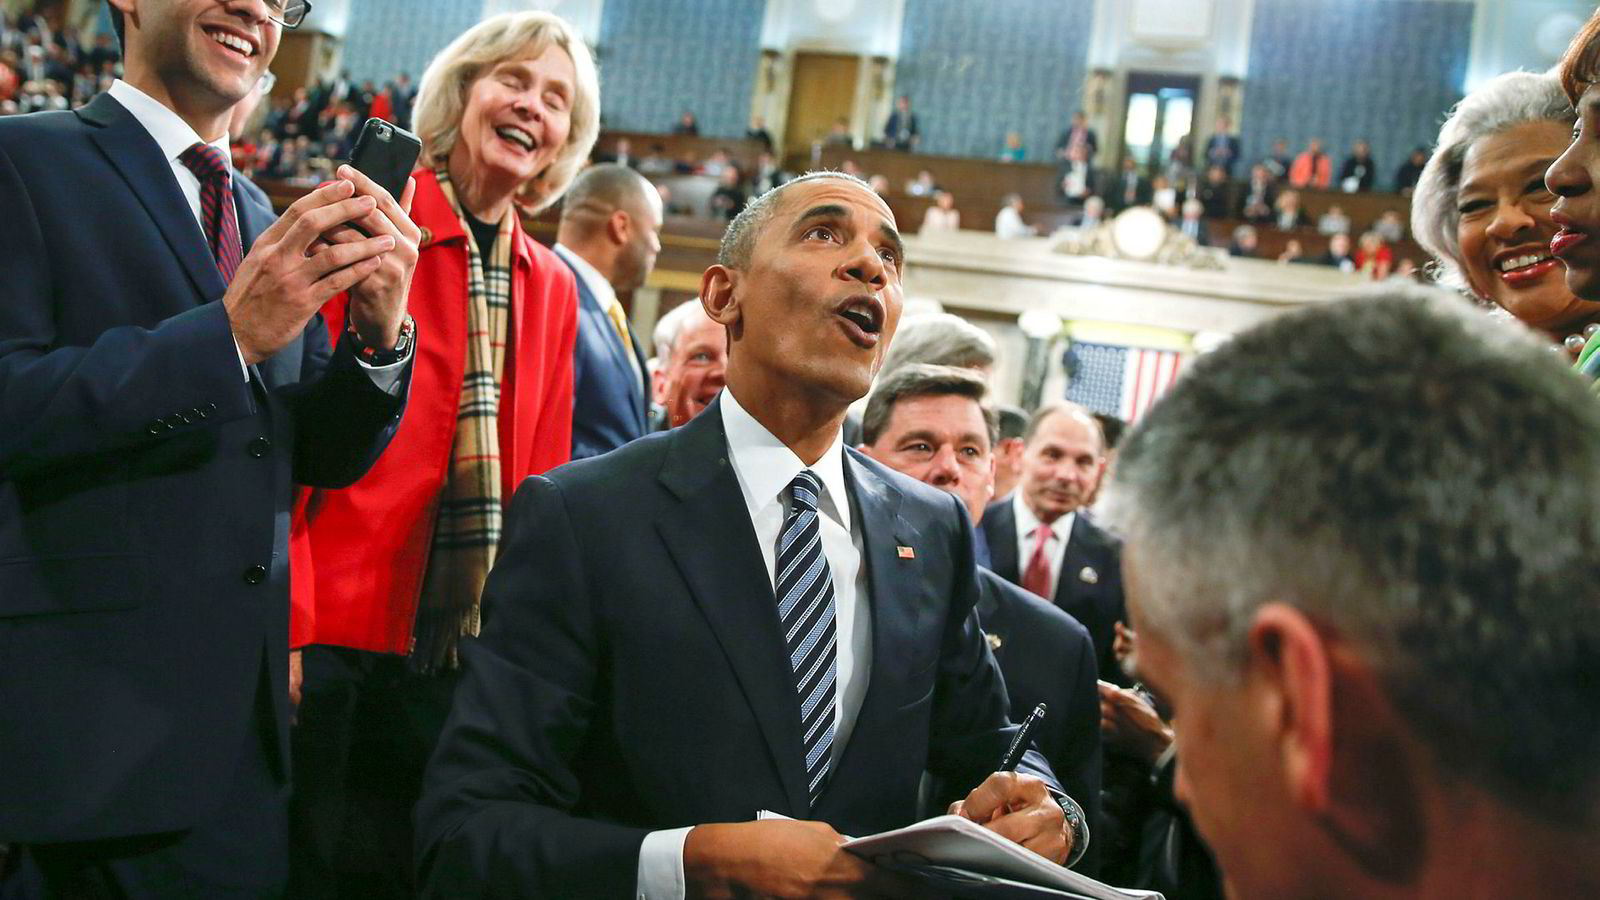 Amerikanere valgte Barack Obama som sin øverste leder, fordi han var en dyktig retoriker, men ikke minst fordi har klarte å formidle et håp om fremtiden, skriver artikkelforfatteren,